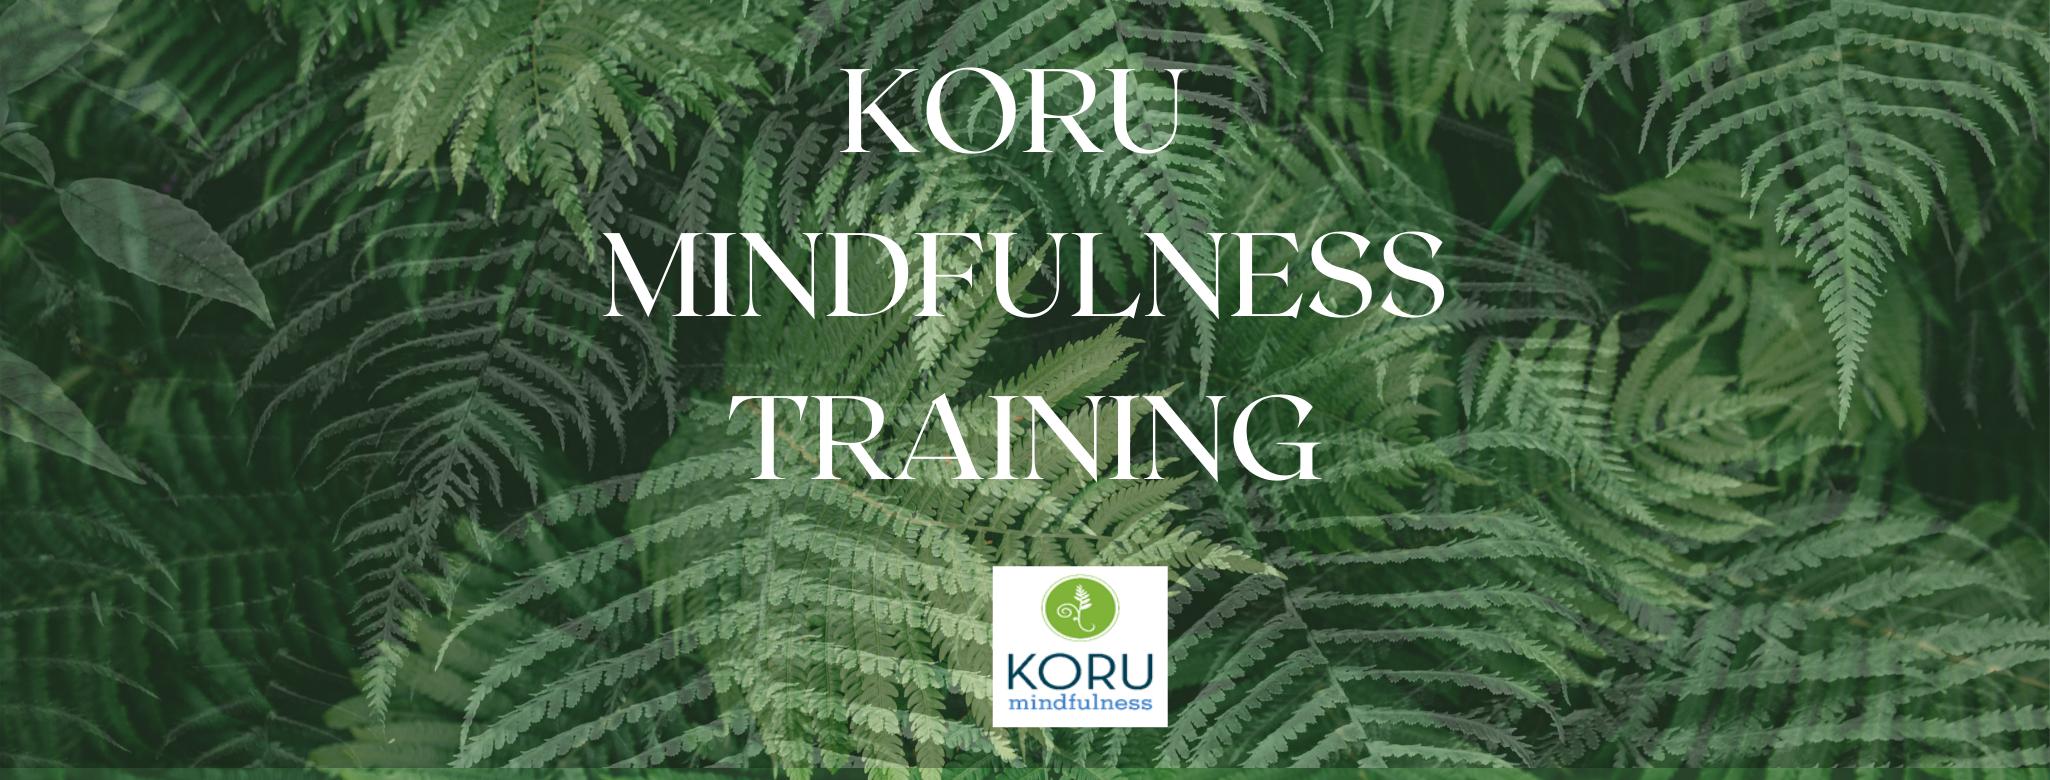 KORU Mindfulness with ferns for OHA slider